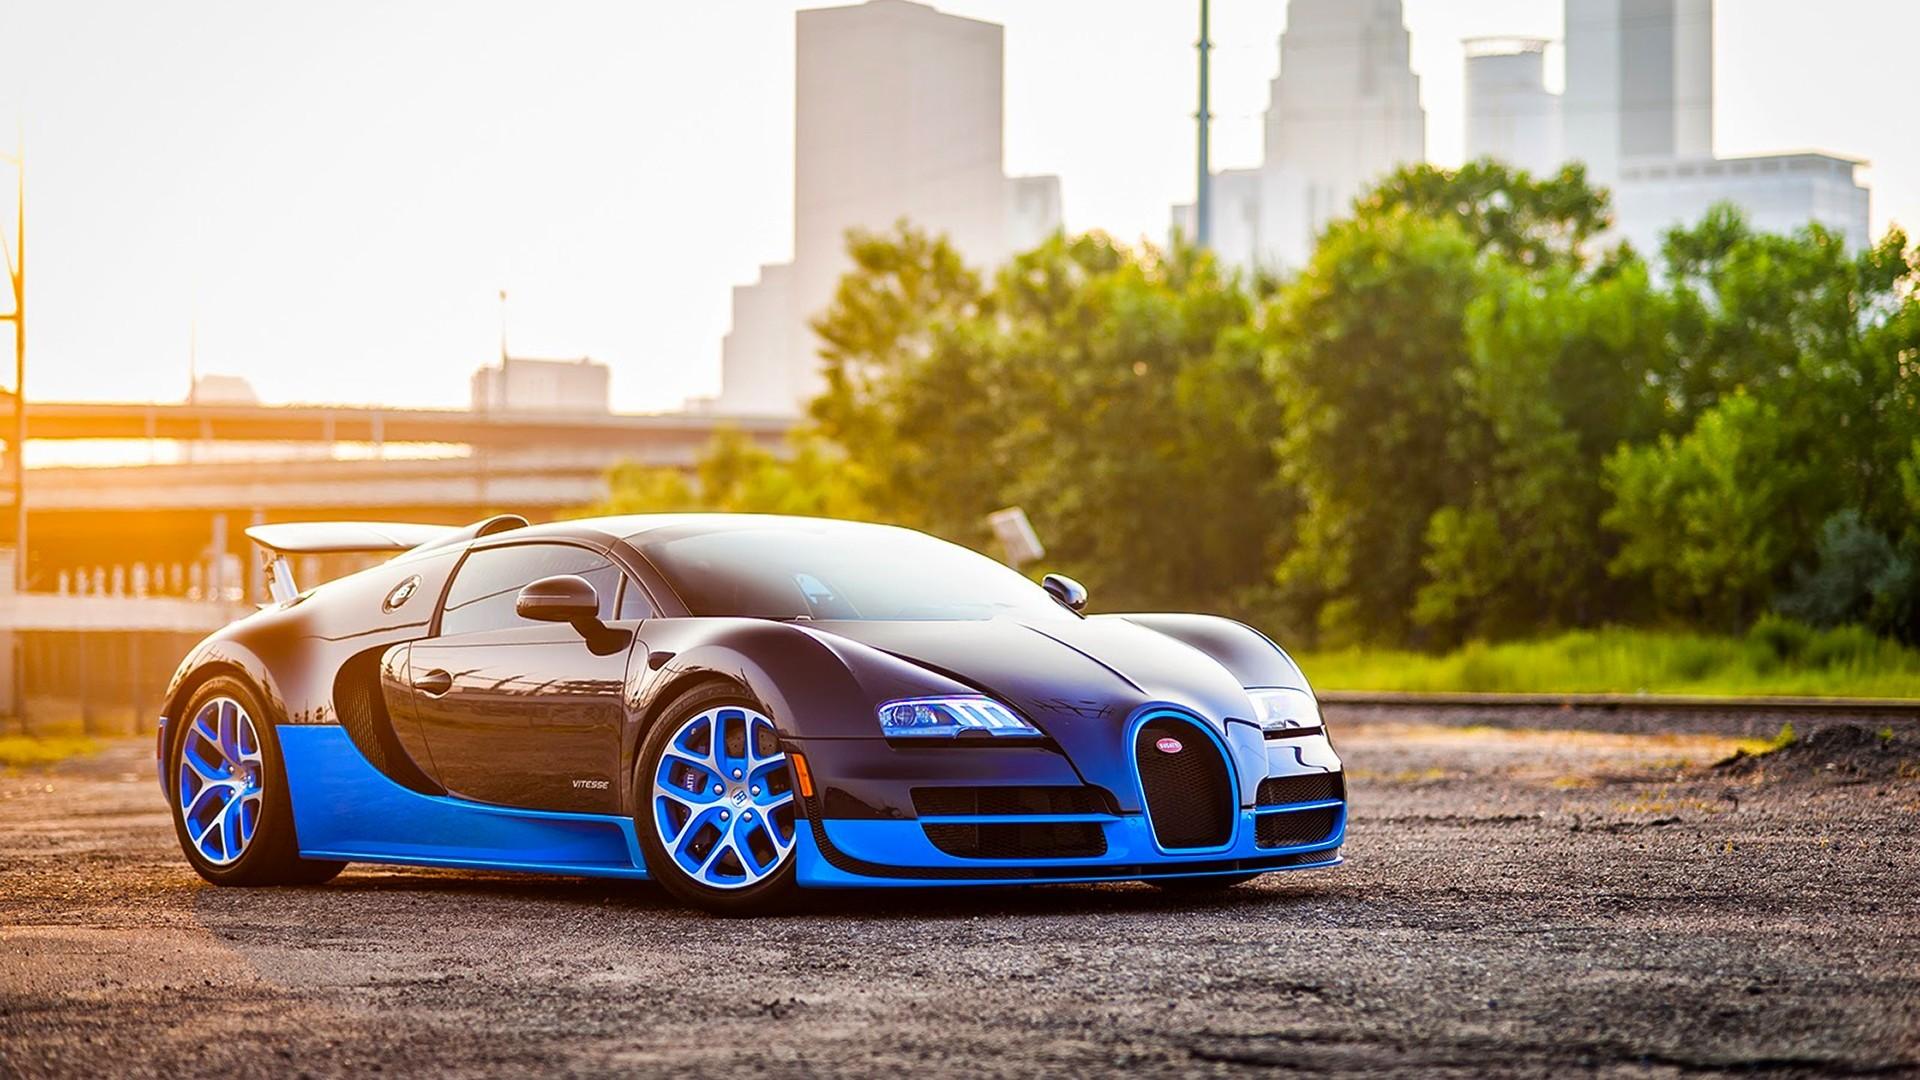 Bugatti Veyron Wallpapers 1